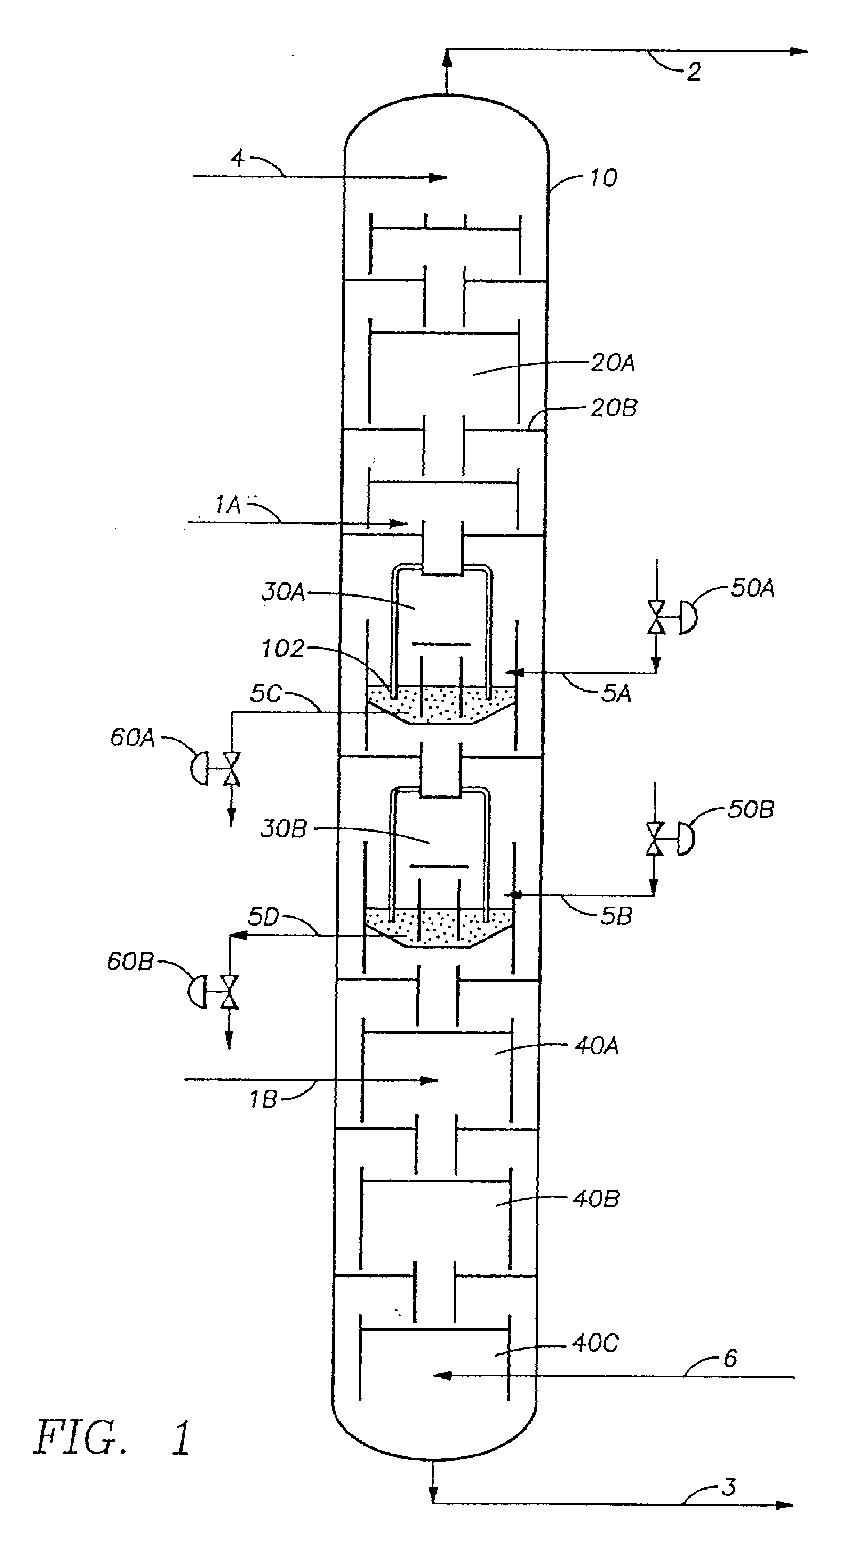 how to get vapor velocity in distillation column